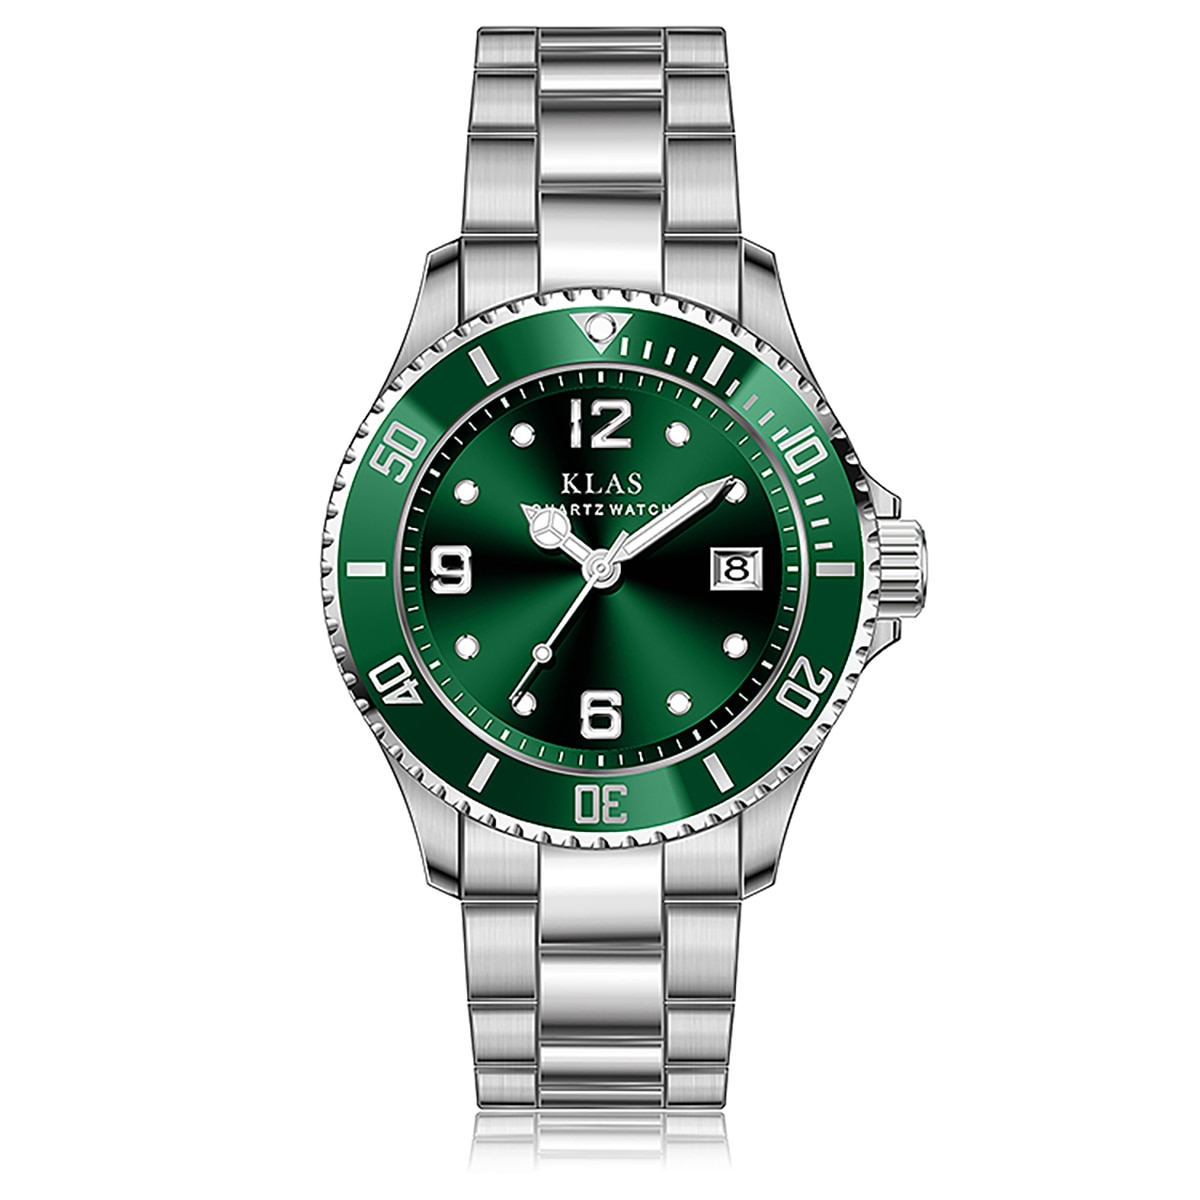 Men Luxury Watches Quartz Watch Stainless Steel Dial Casual Bracele Watch Sports Quartz Wristwatch clock KLAS enlarge